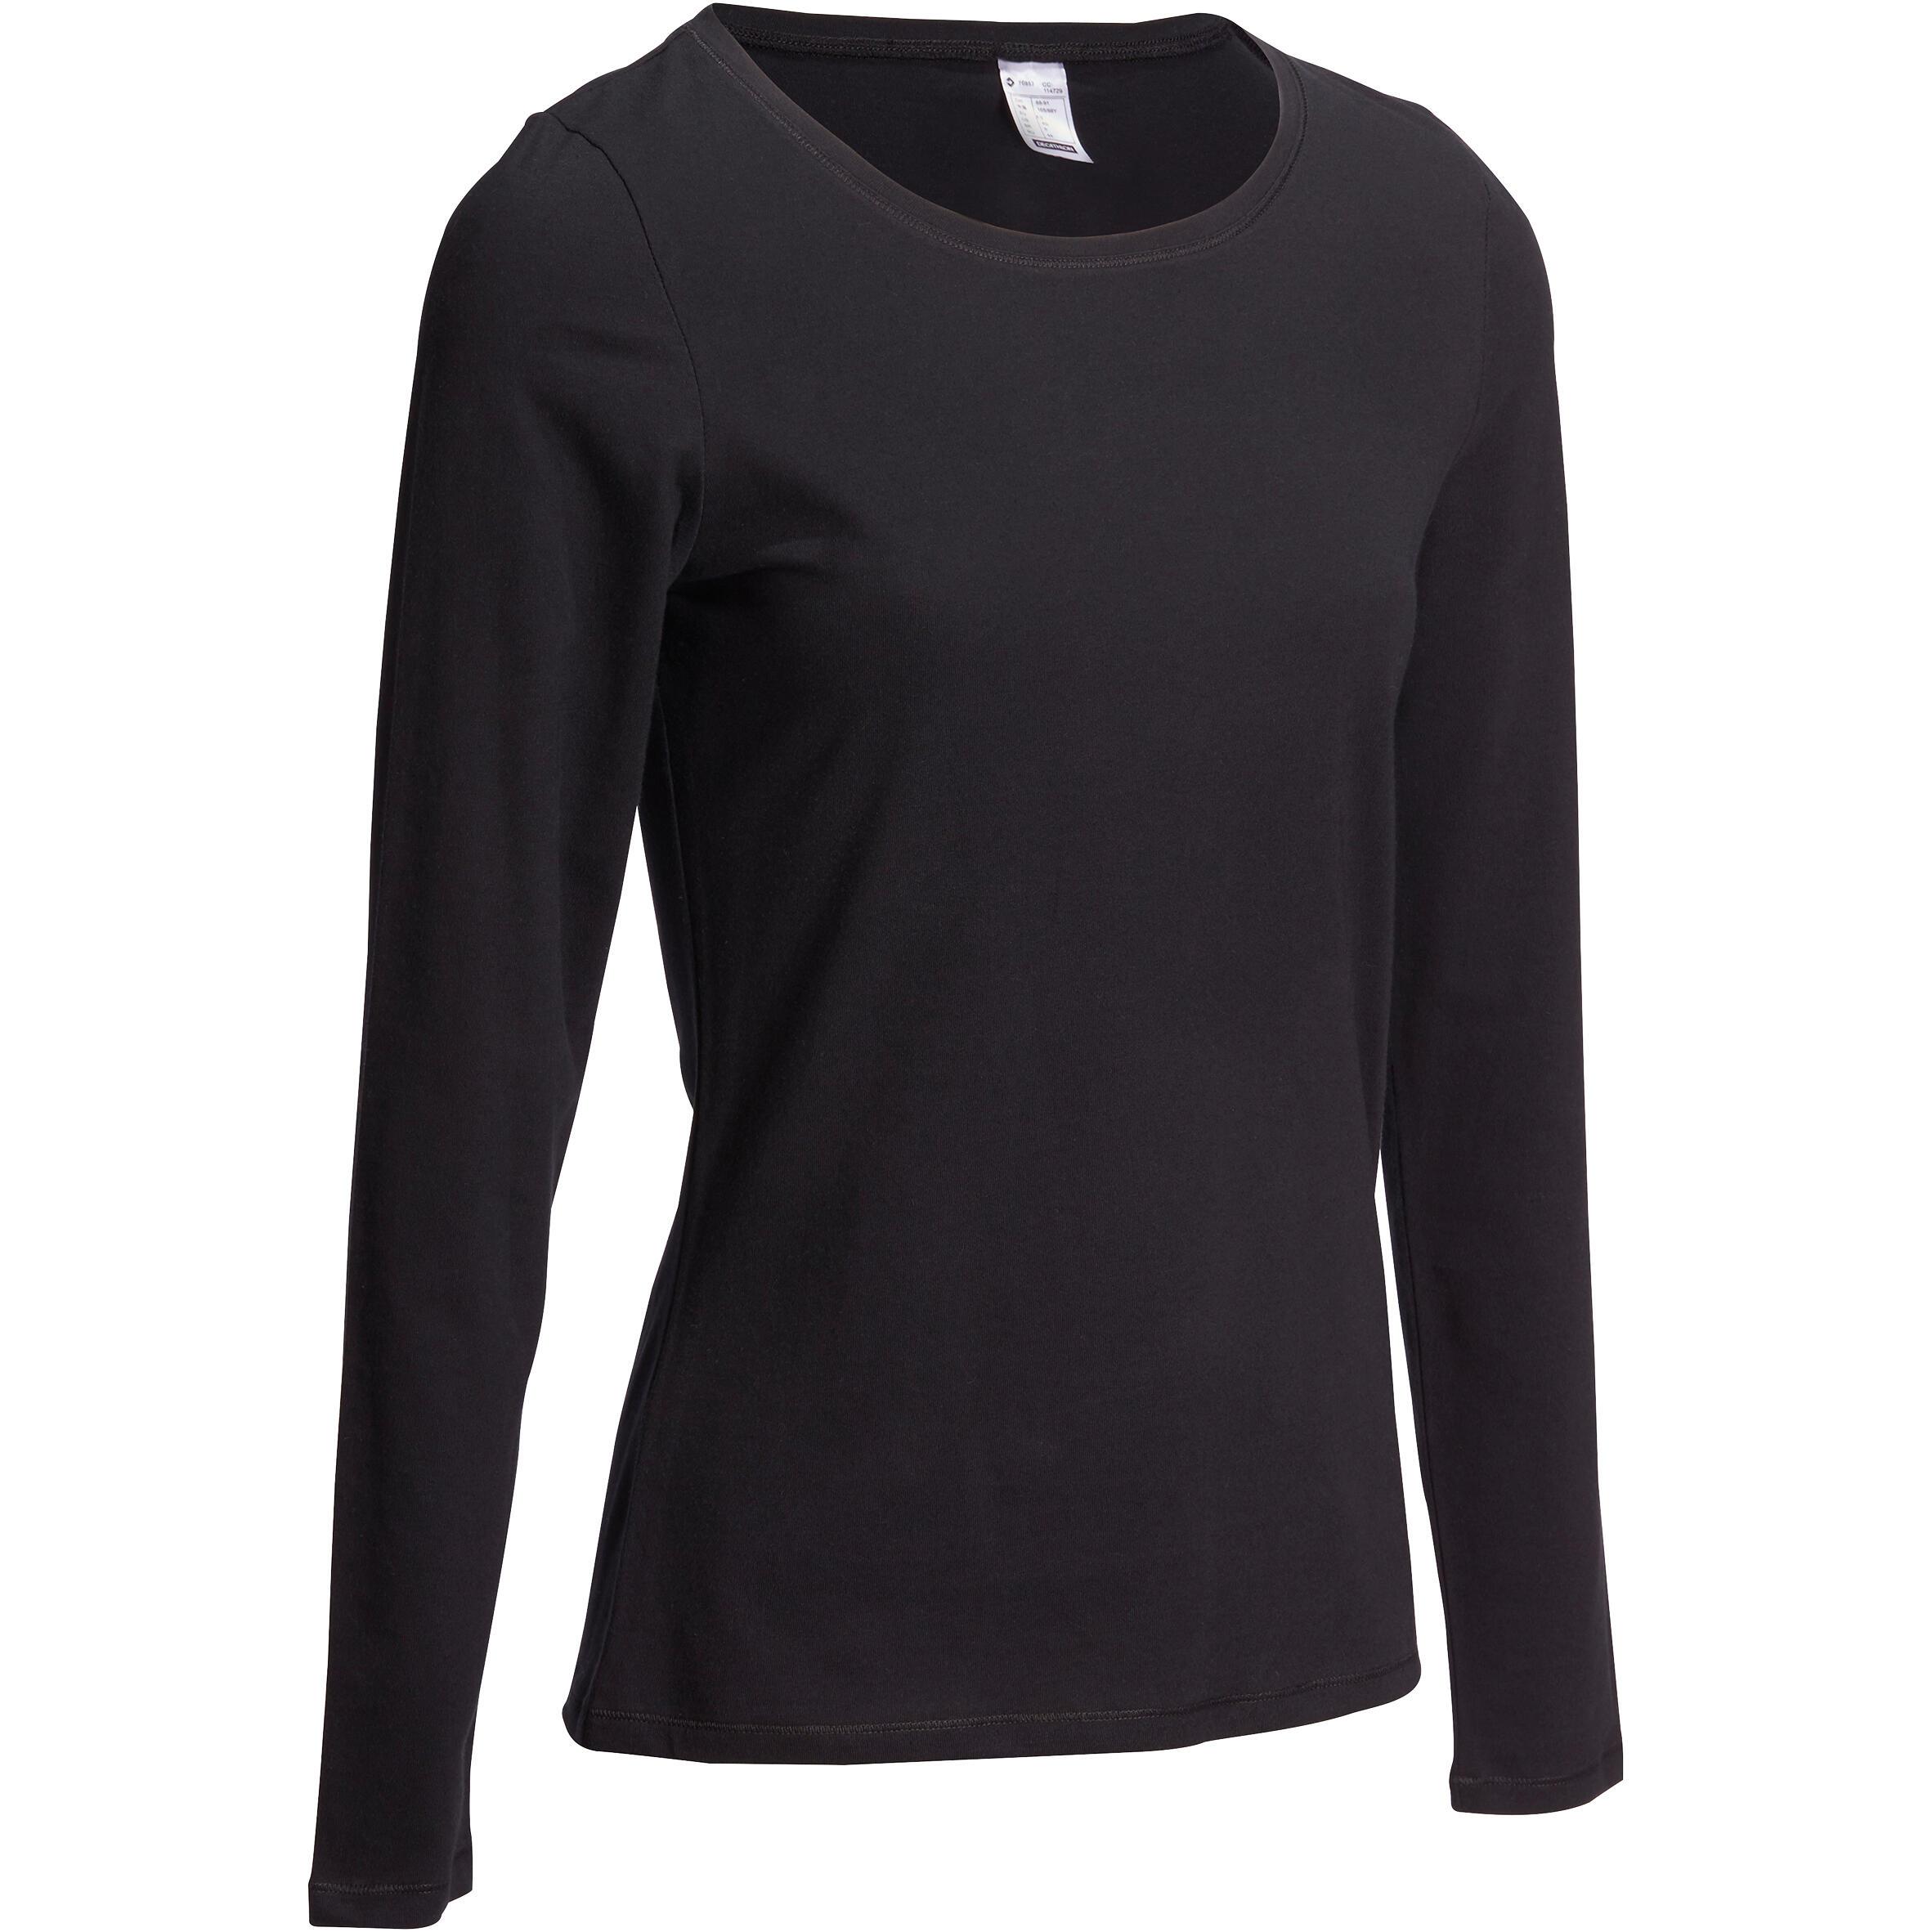 100 Women's Long-Sleeved Gym & Pilates T-Shirt - Black